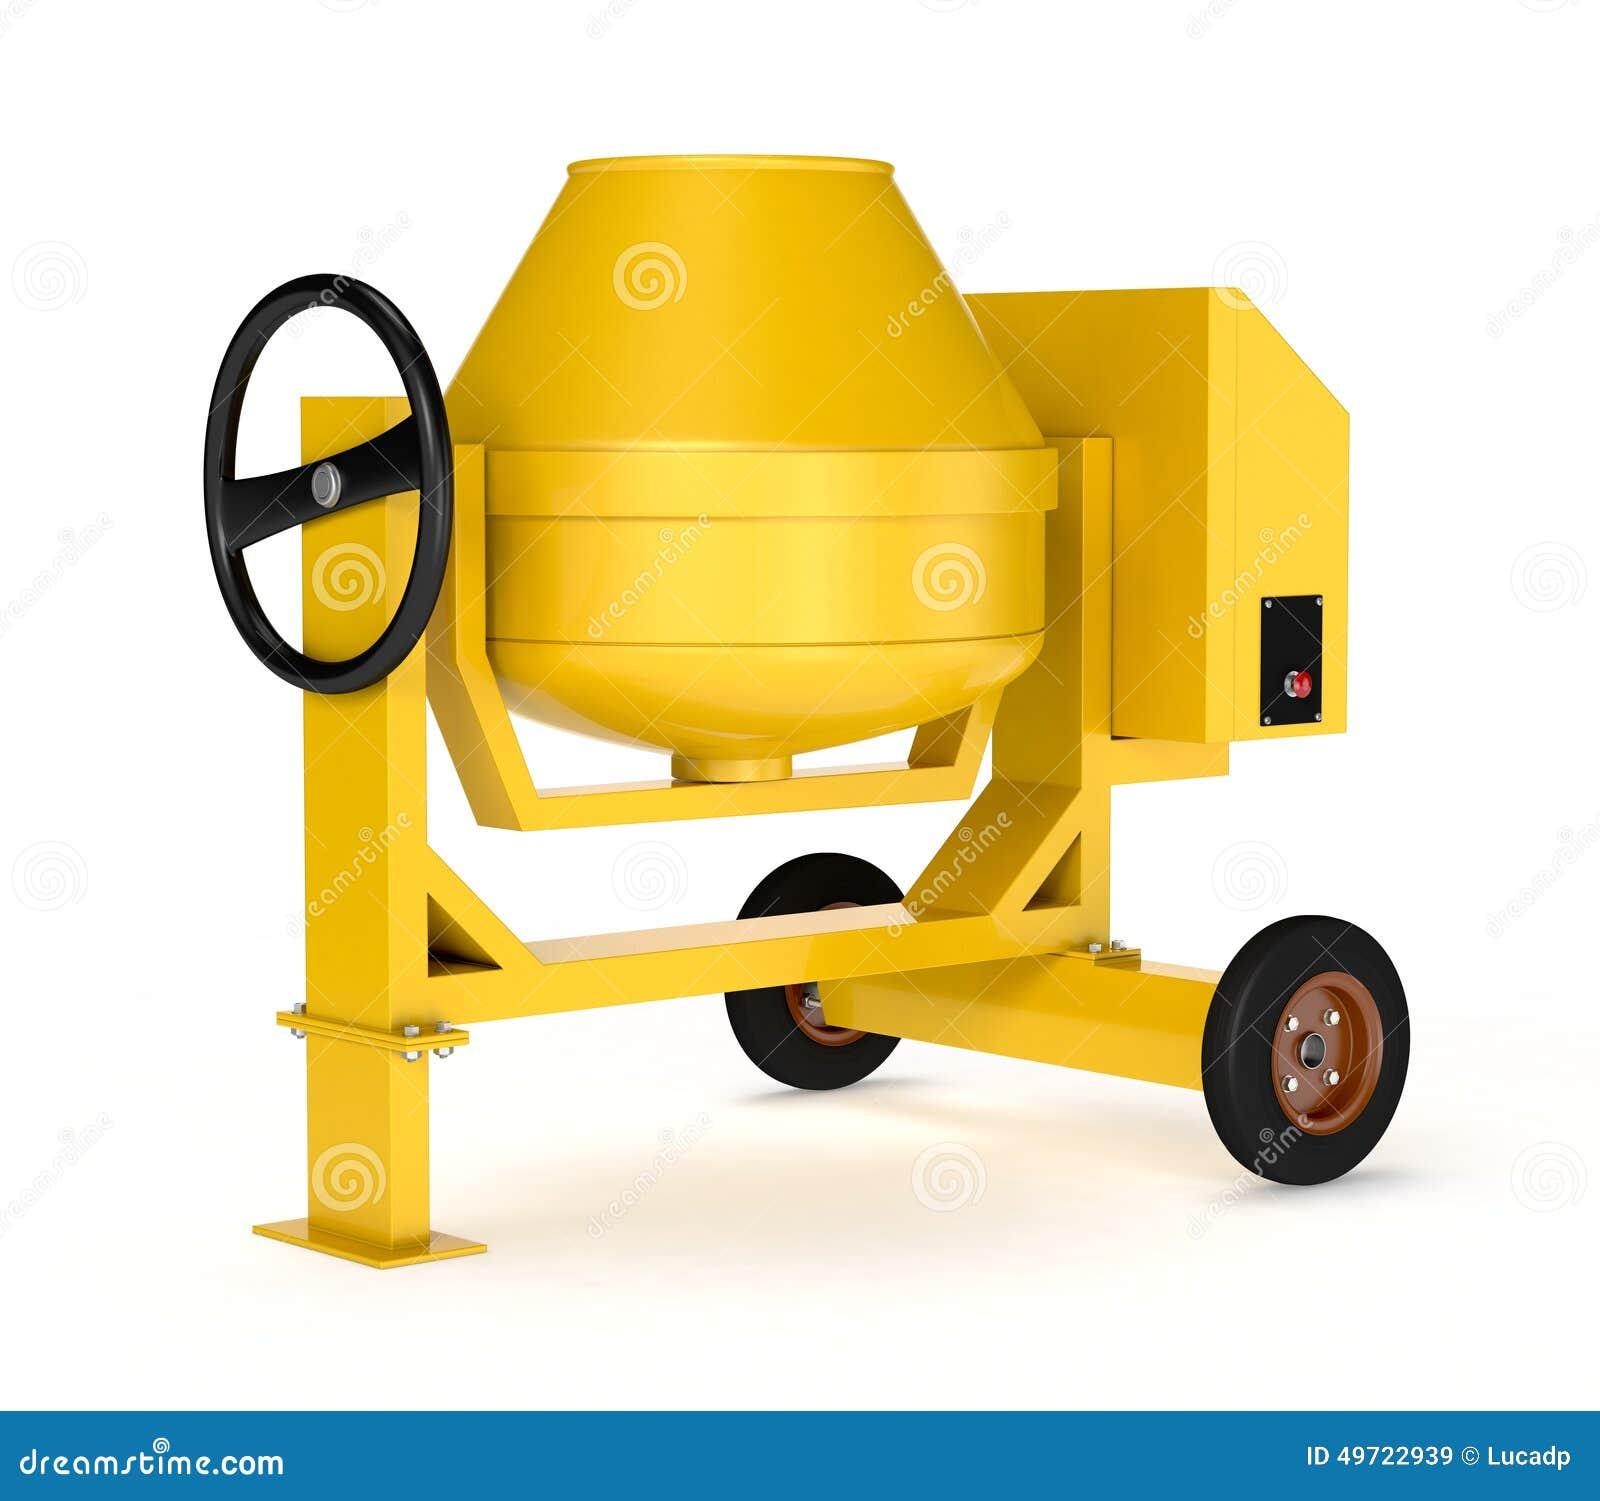 Concrete Mixing Animation : Cement mixer stock illustration image